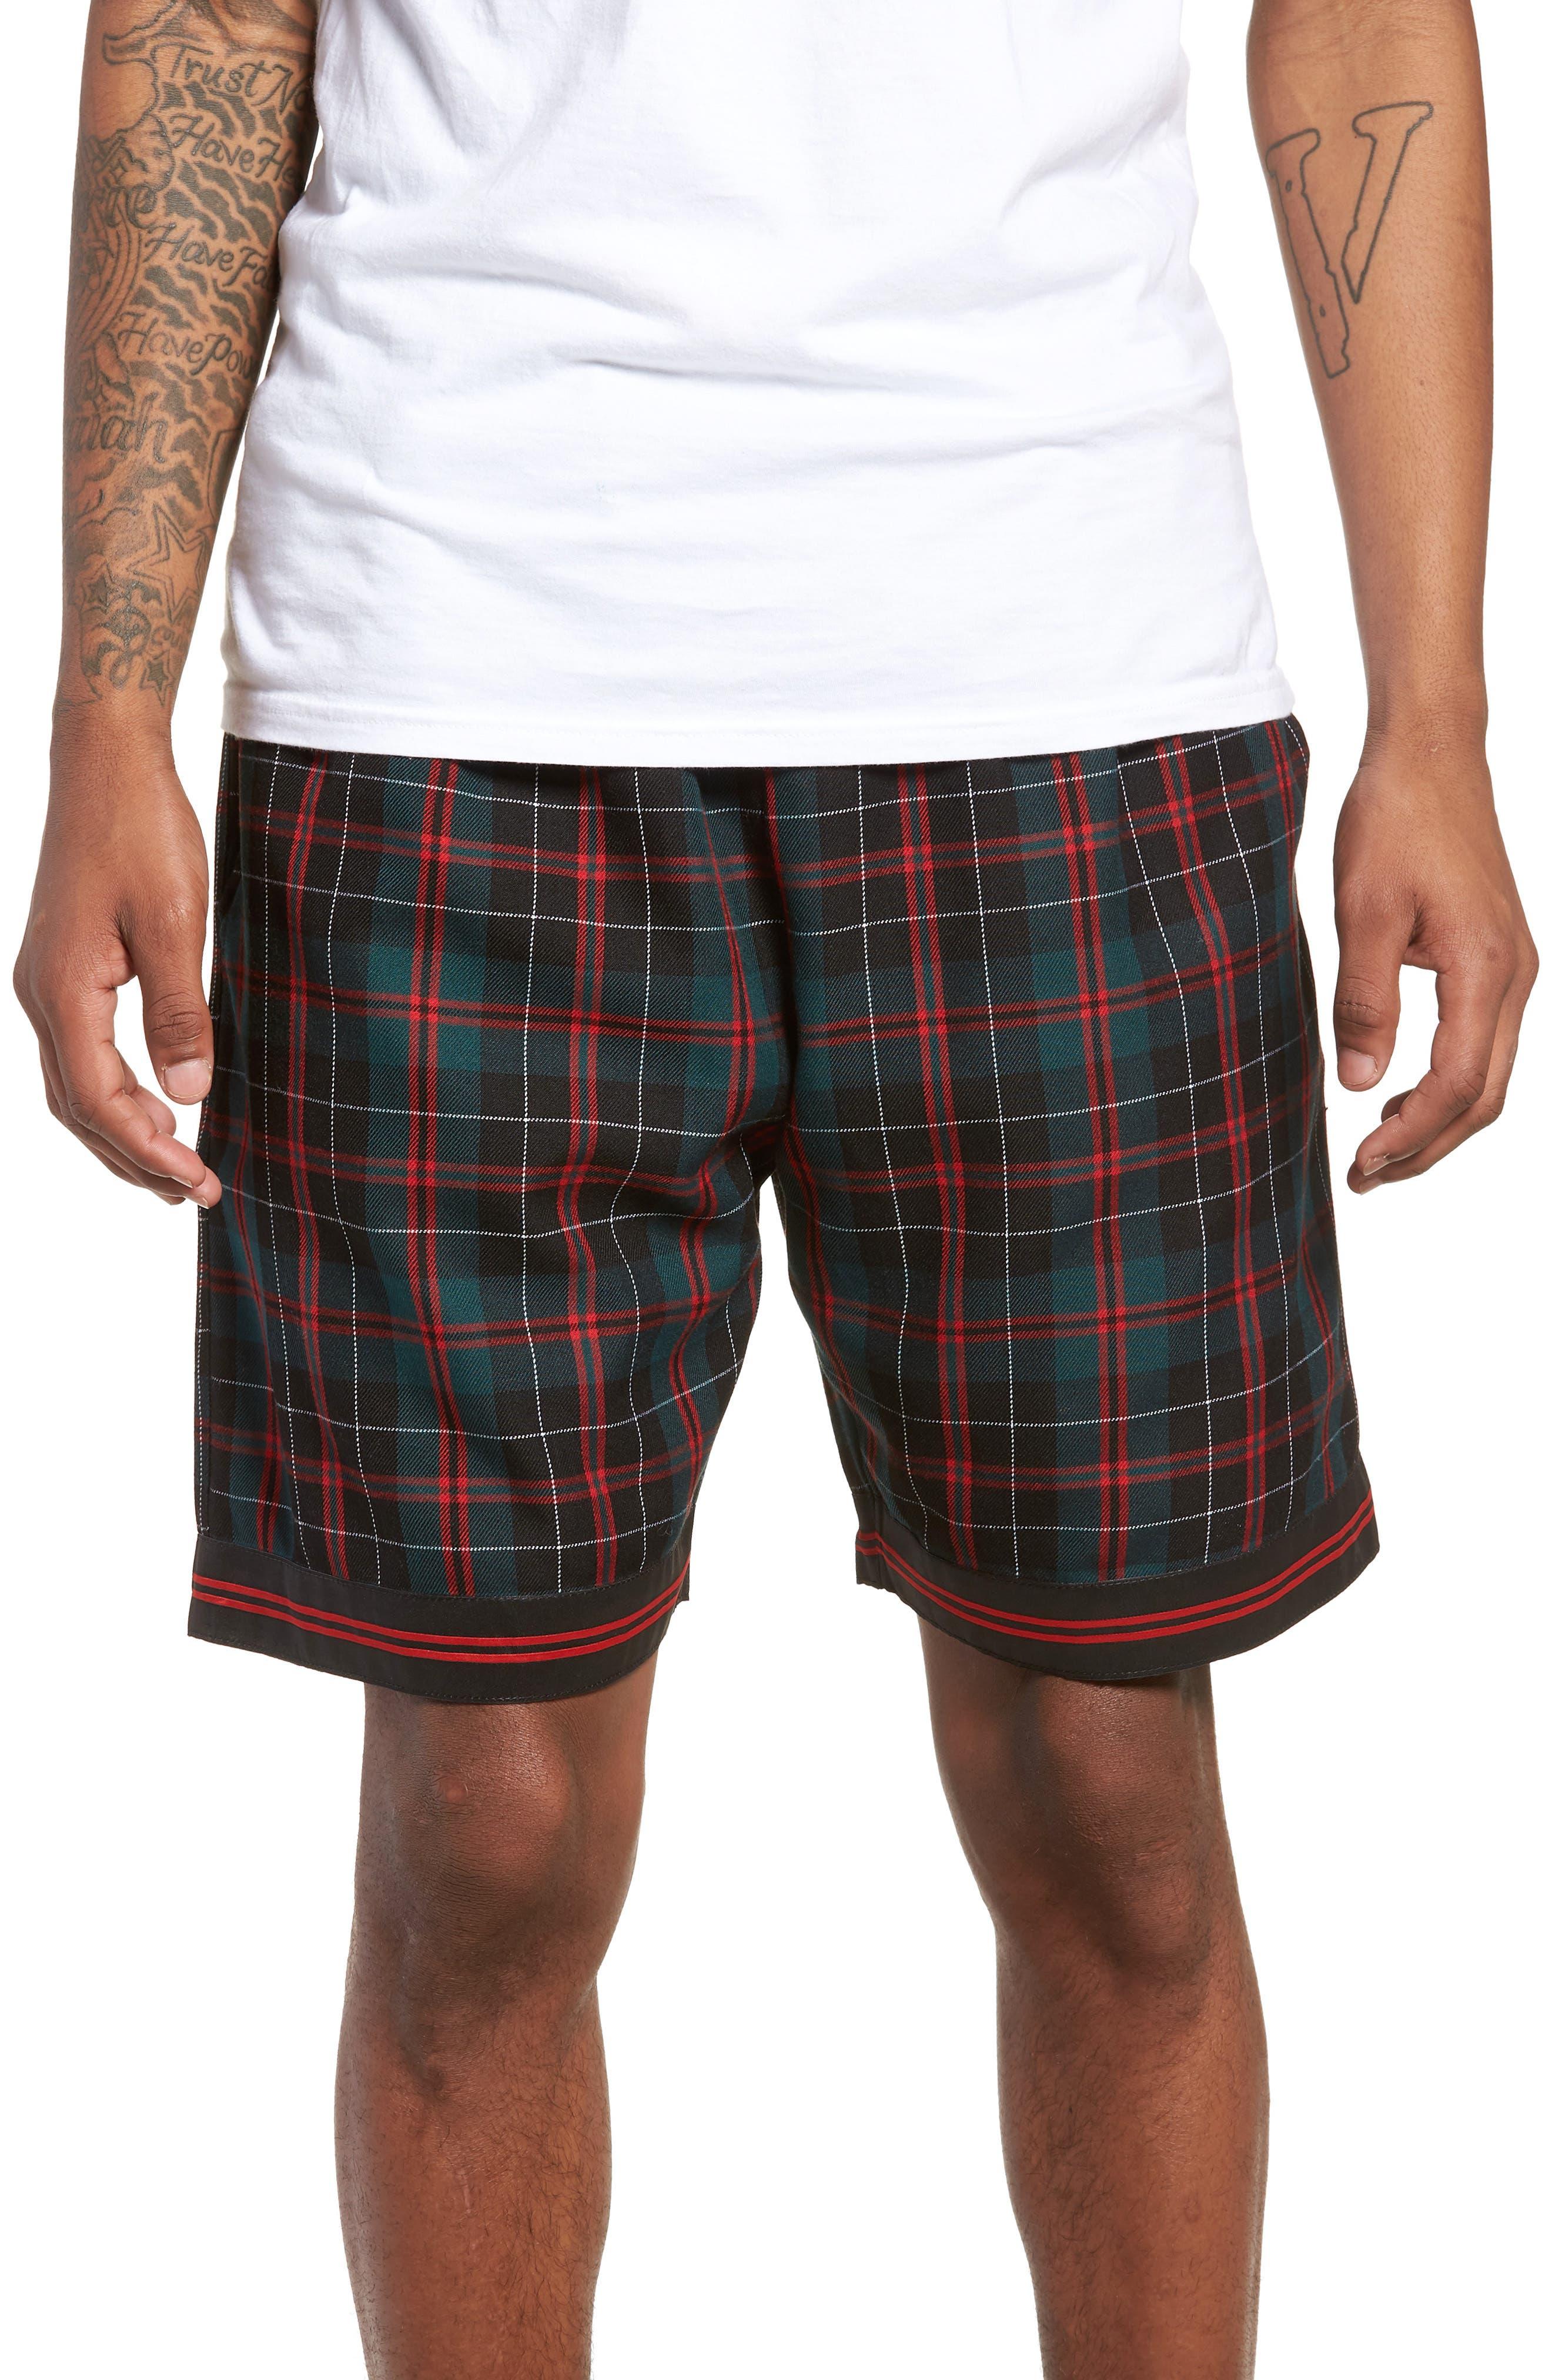 Represent Tartan Drawstring Shorts